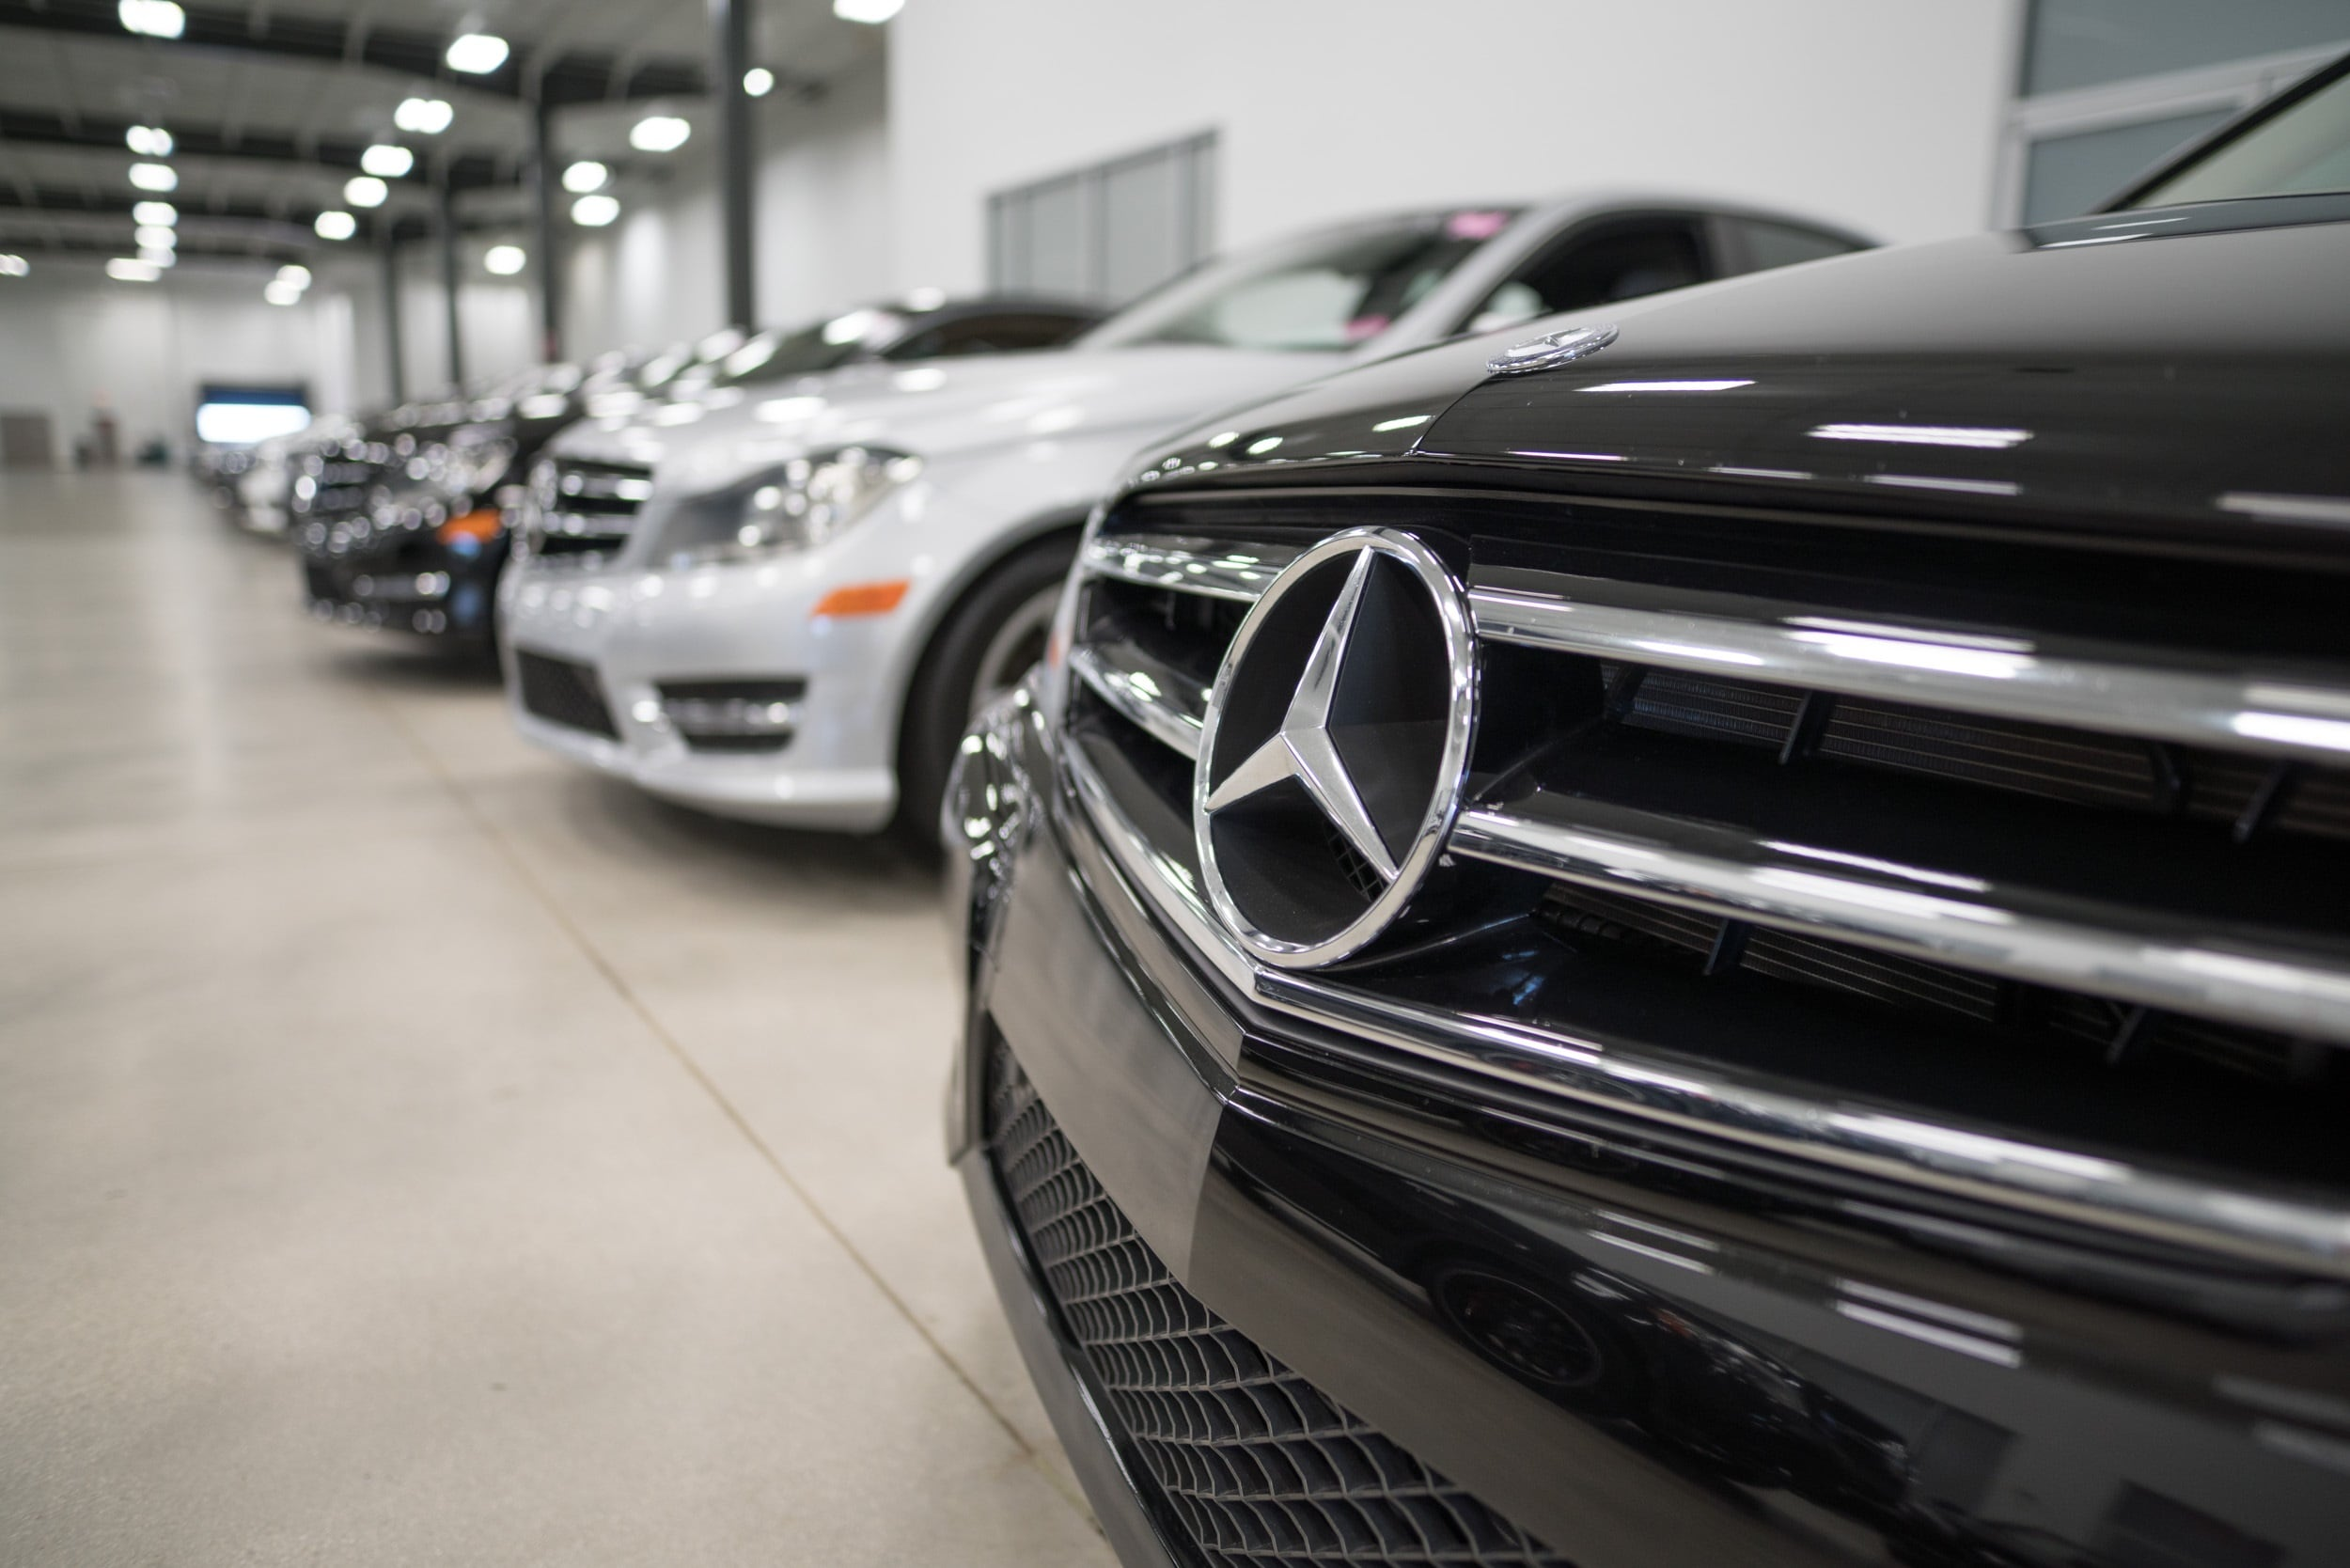 Mercedes Dealership Near Me North Houston MercedesBenz Of - Mercedes benz repair near me